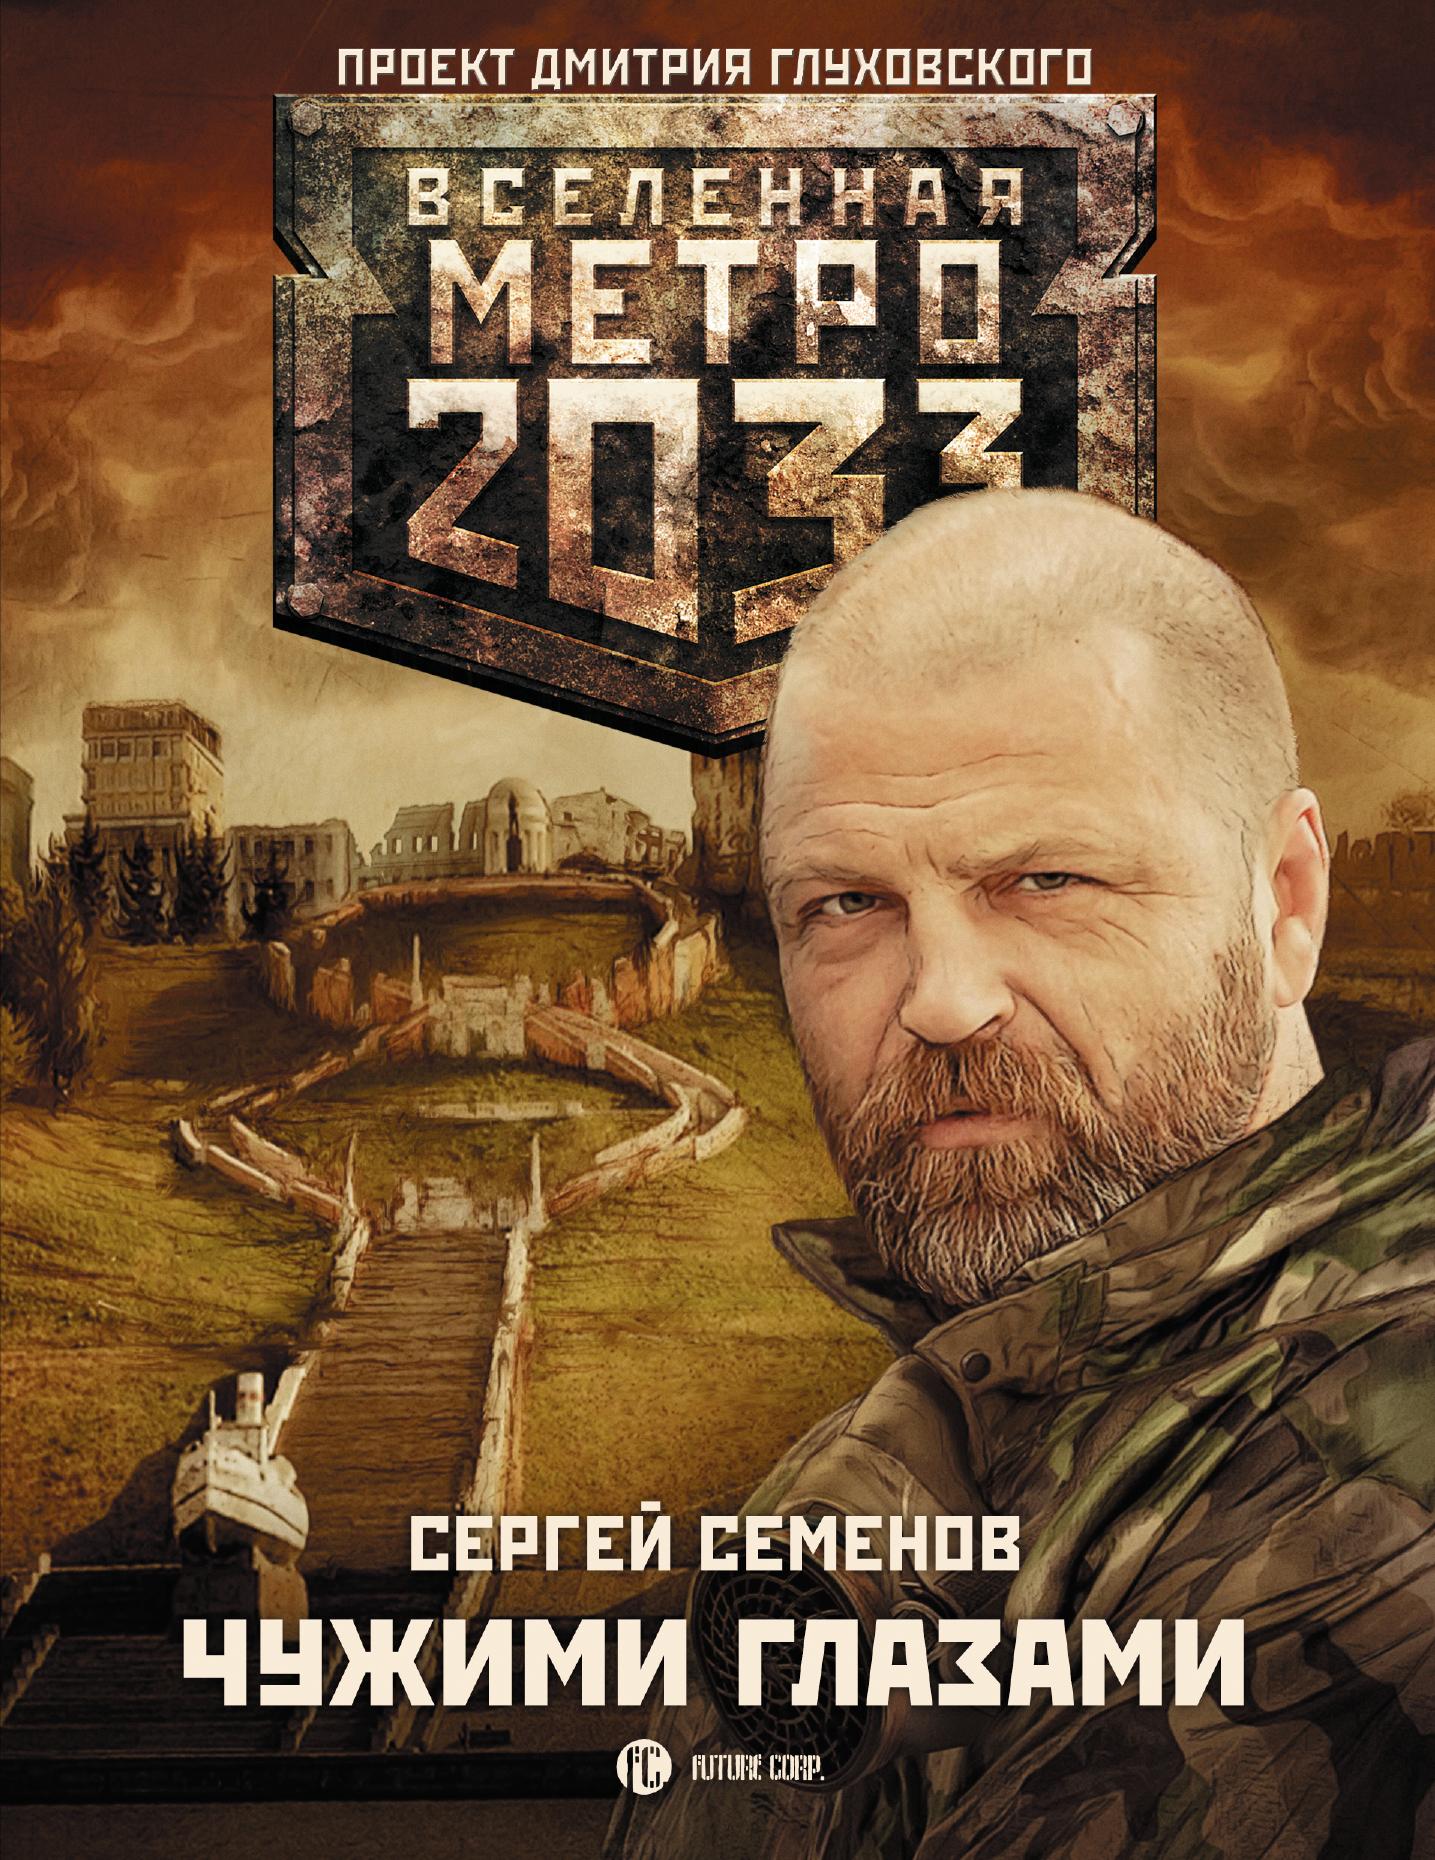 Семенов С.А. Метро 2033: Чужими глазами шабалов д метро 2033 право на жизнь